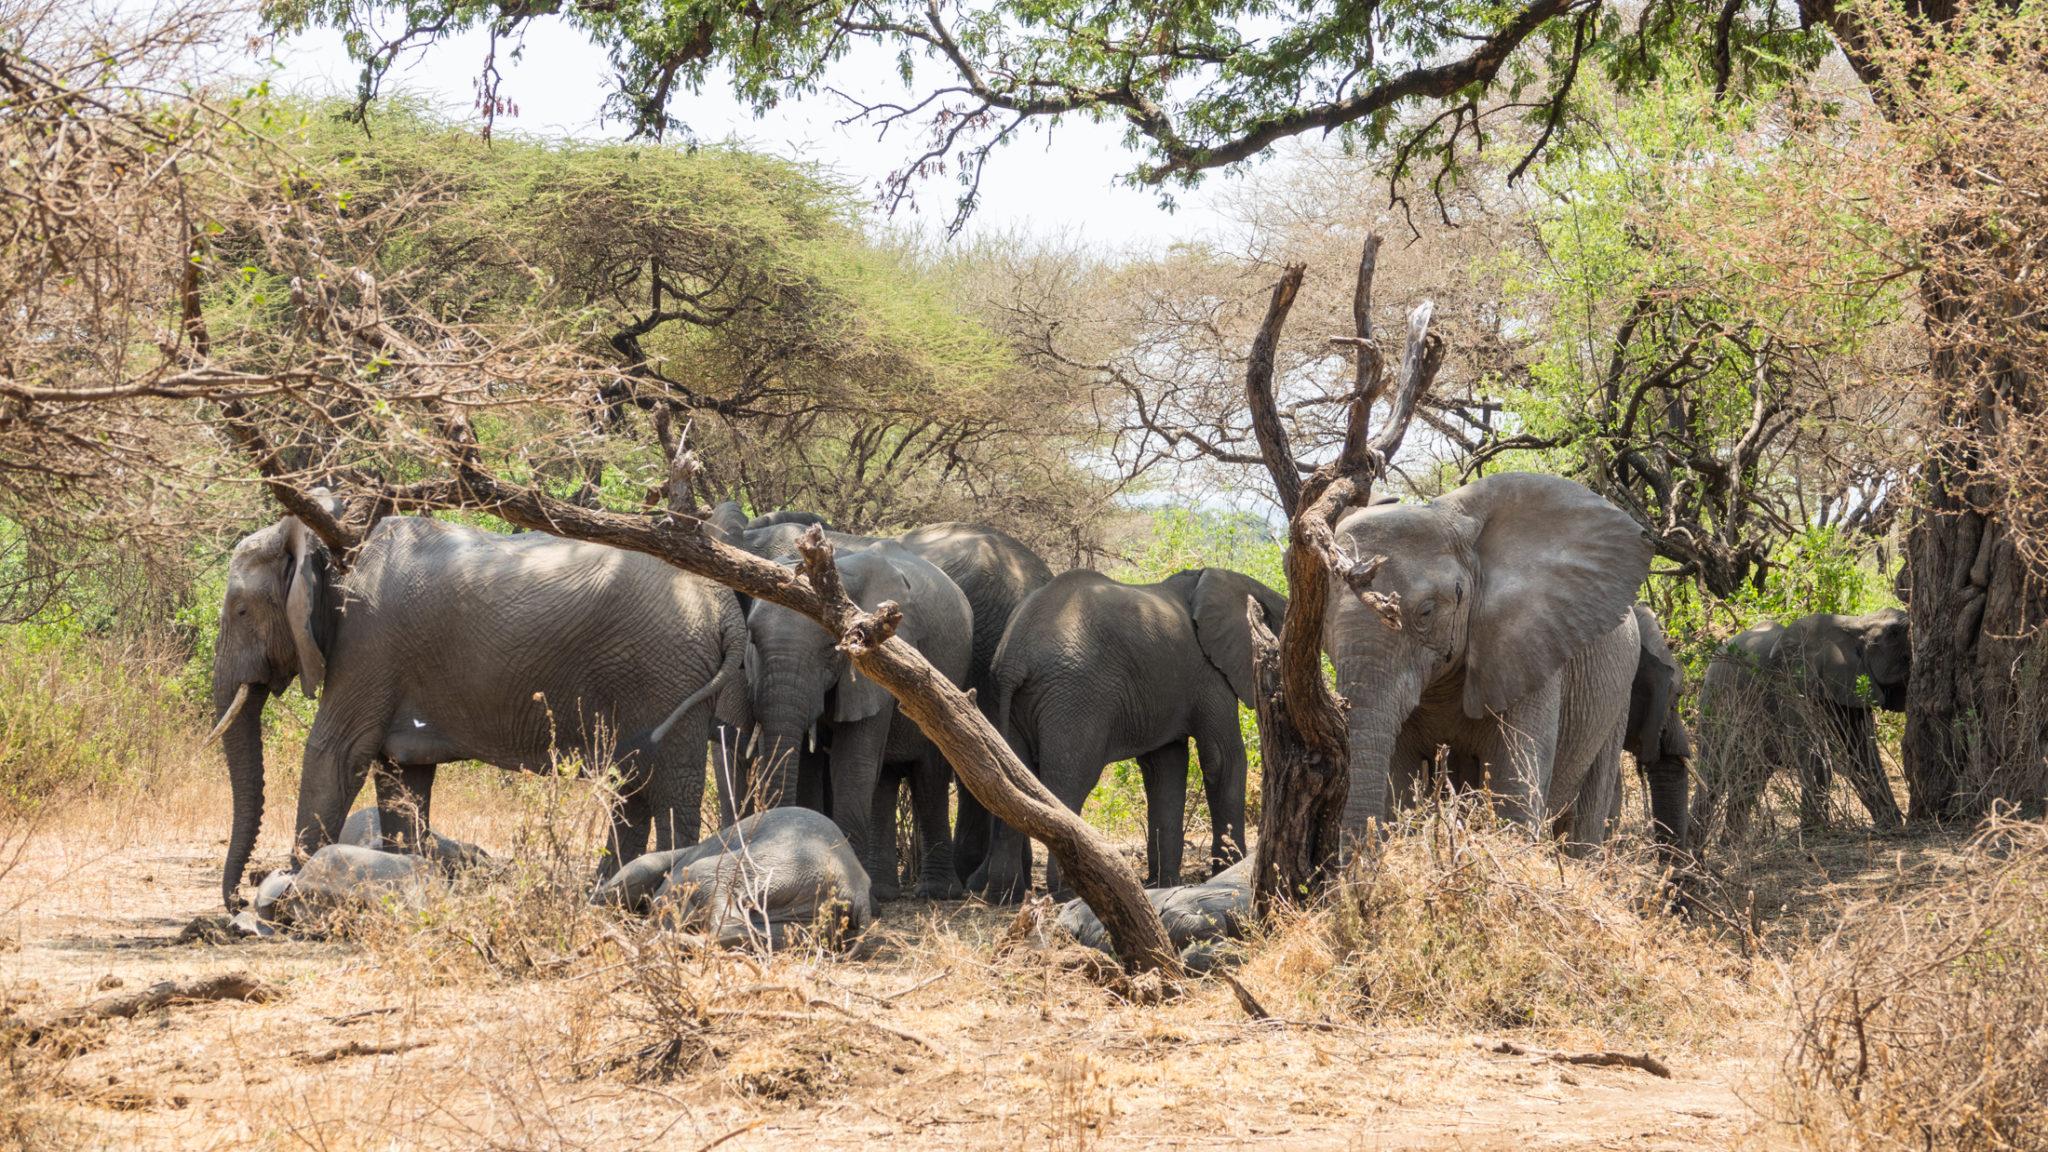 Elefantenherde wartet bis die Babies aufwachen Lake Manyara, Tansania